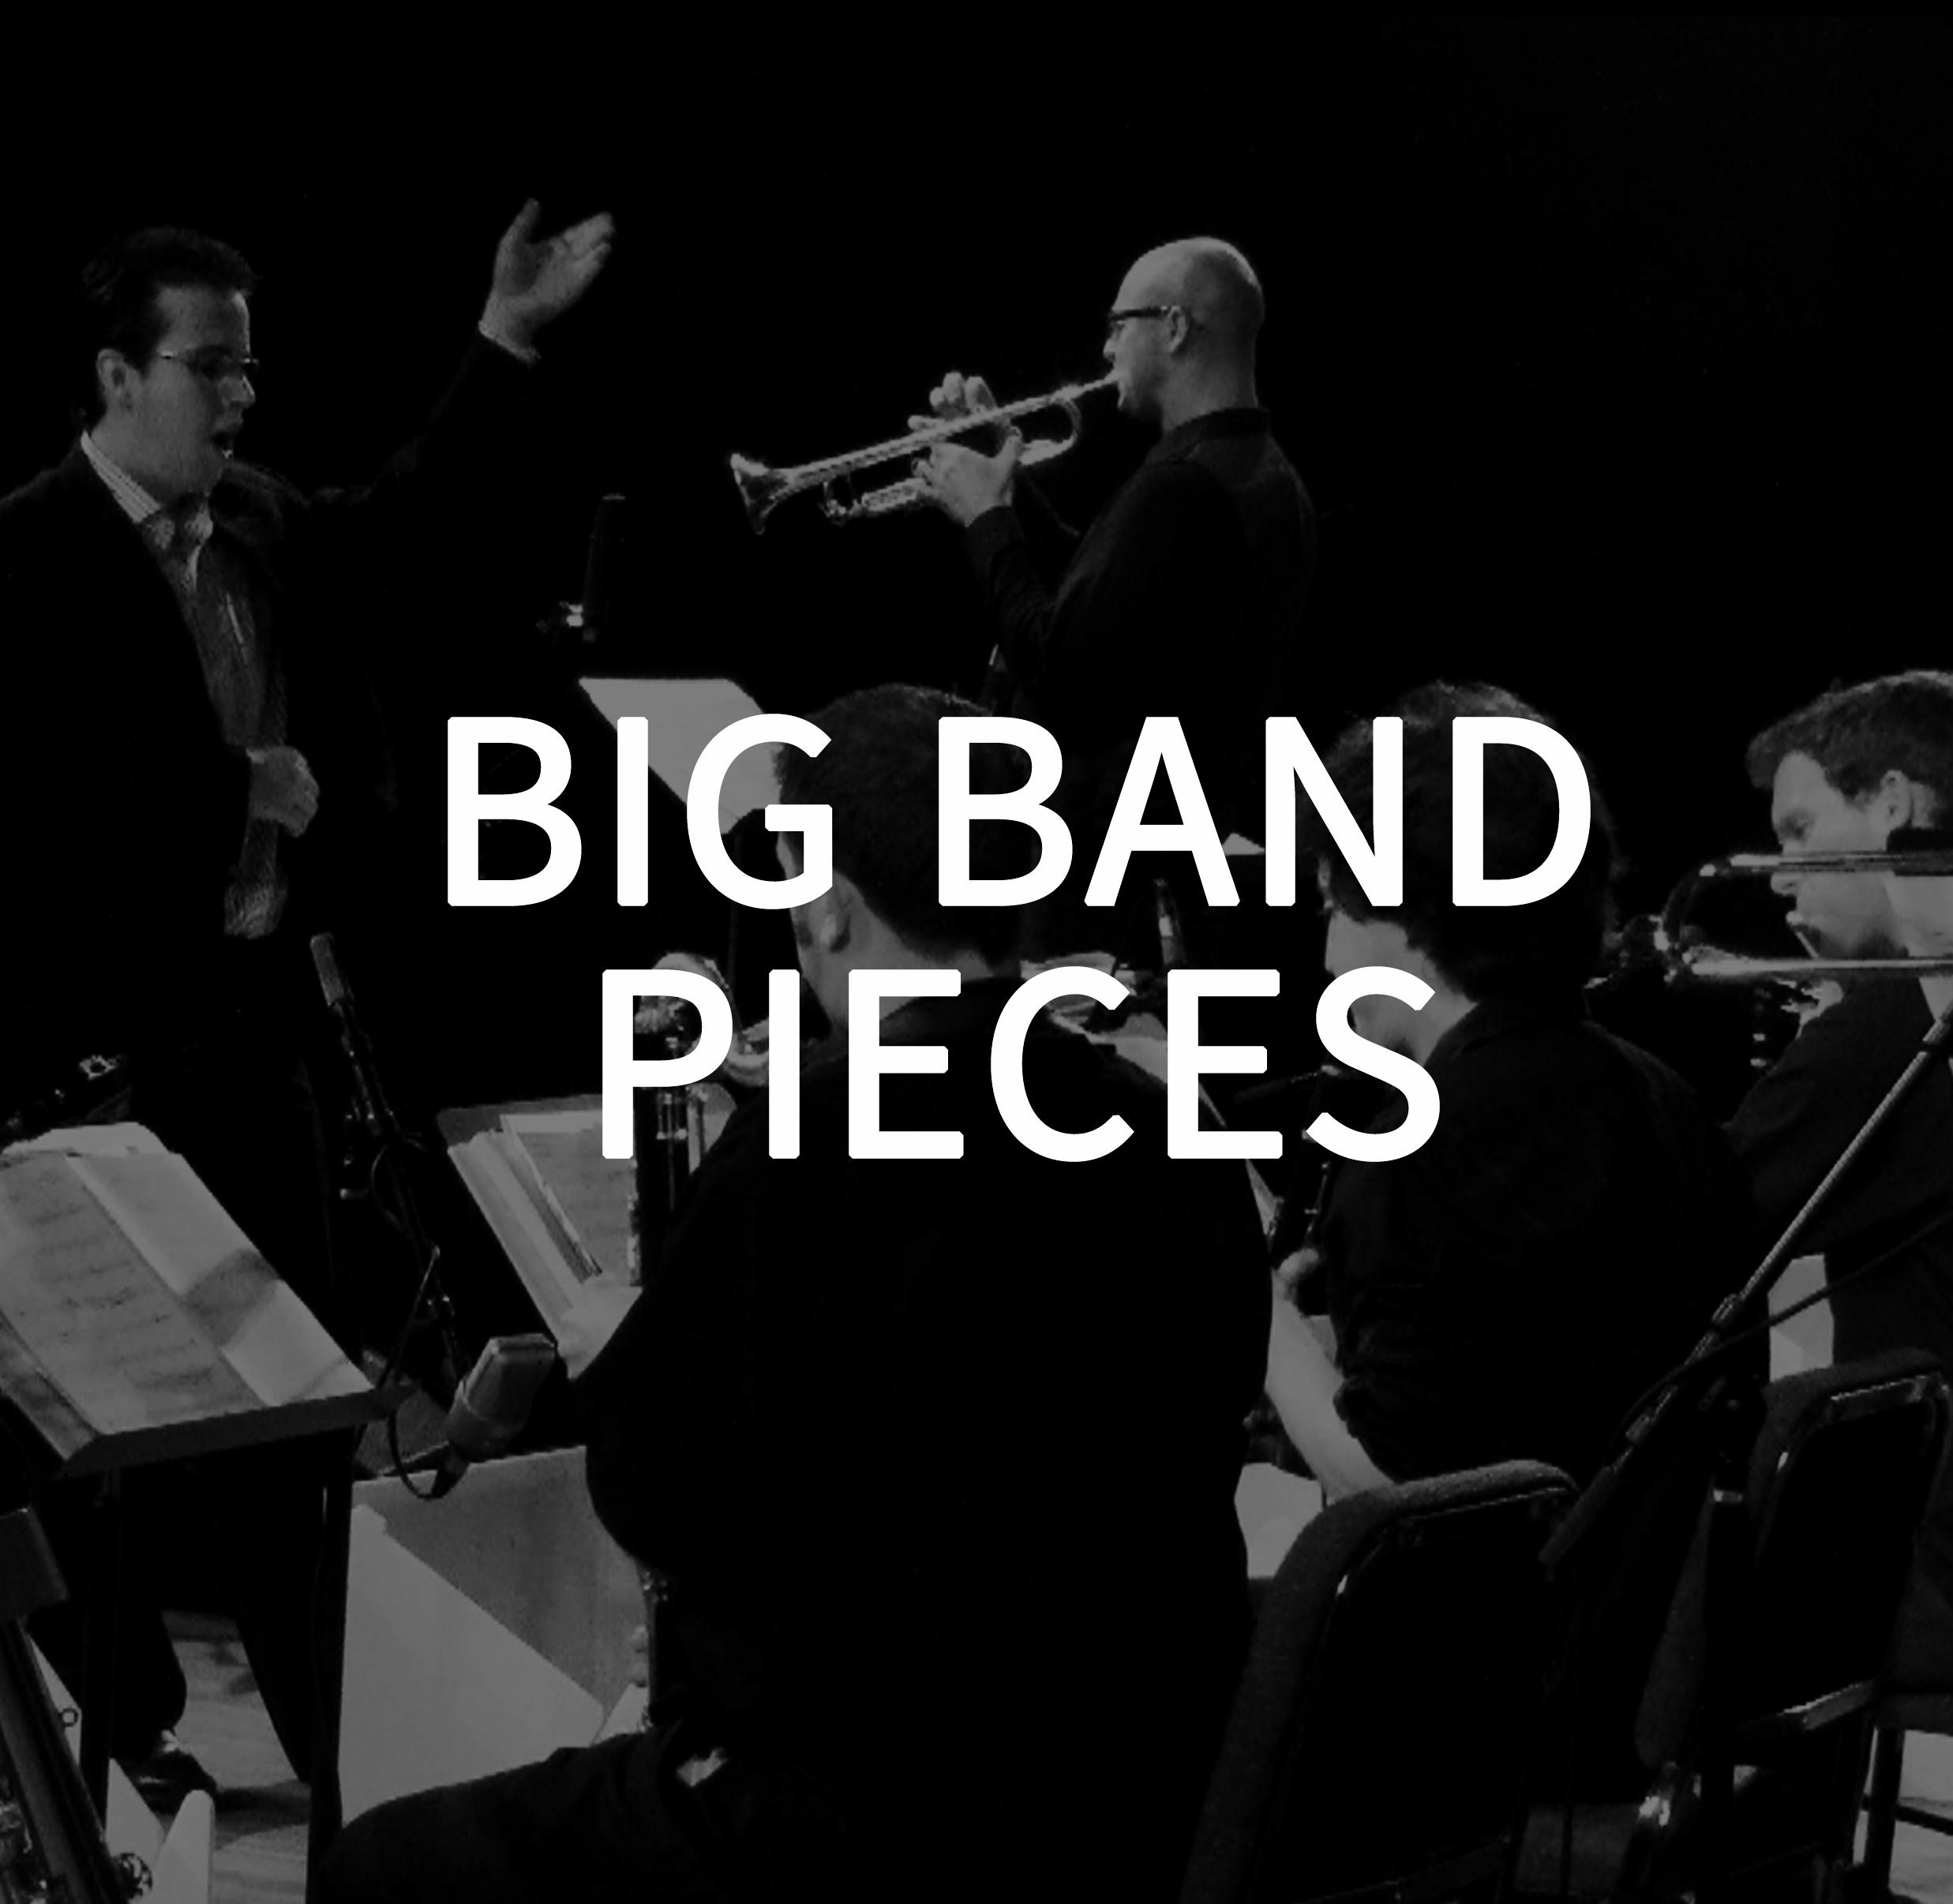 big band pieces botao.jpg